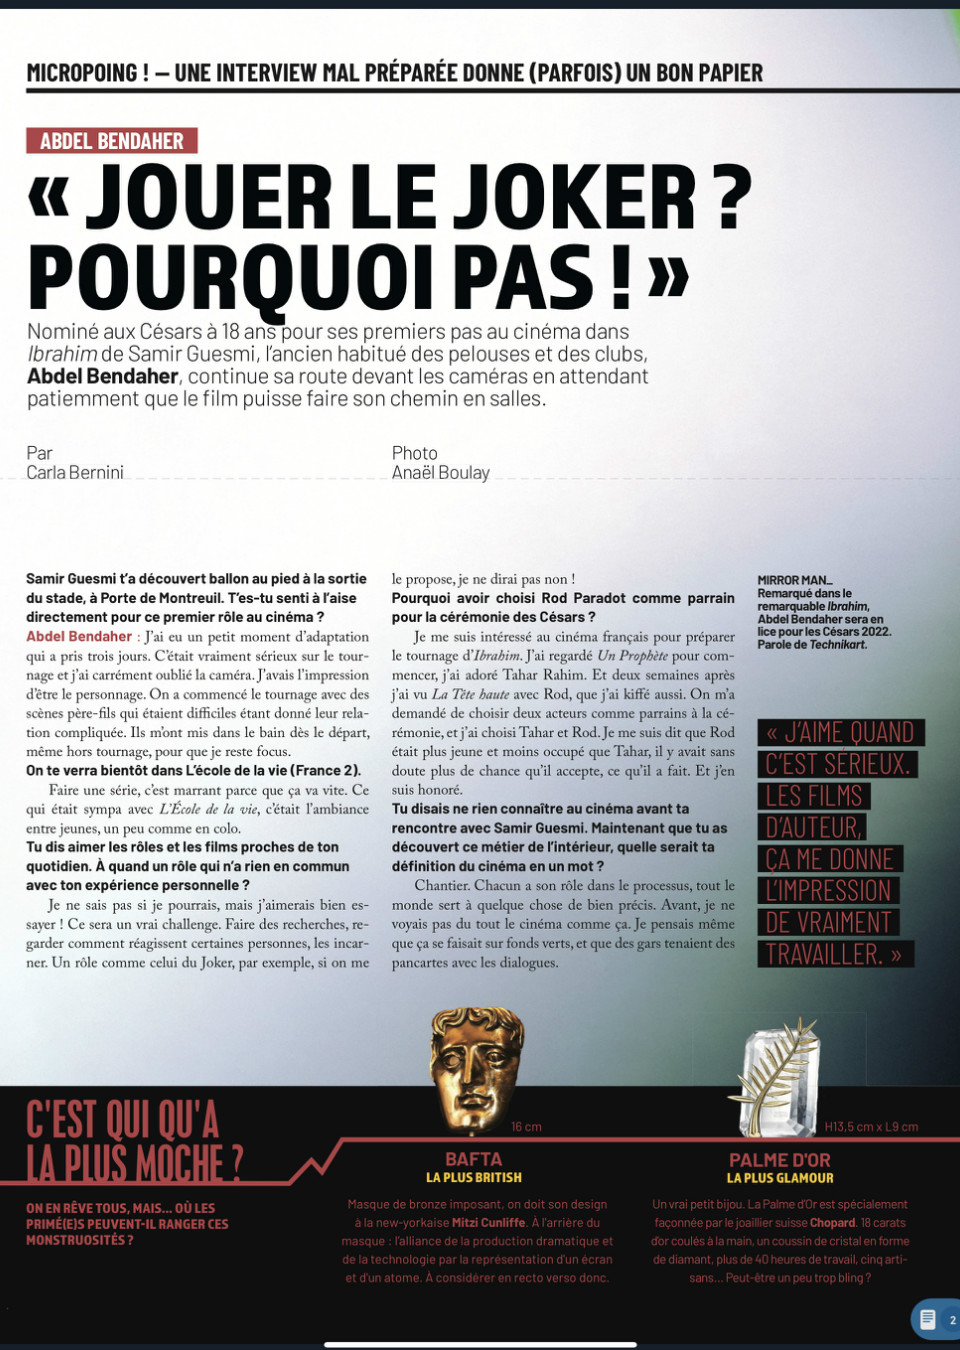 SAFE MGMT Management Paris - Abdel Bendaher